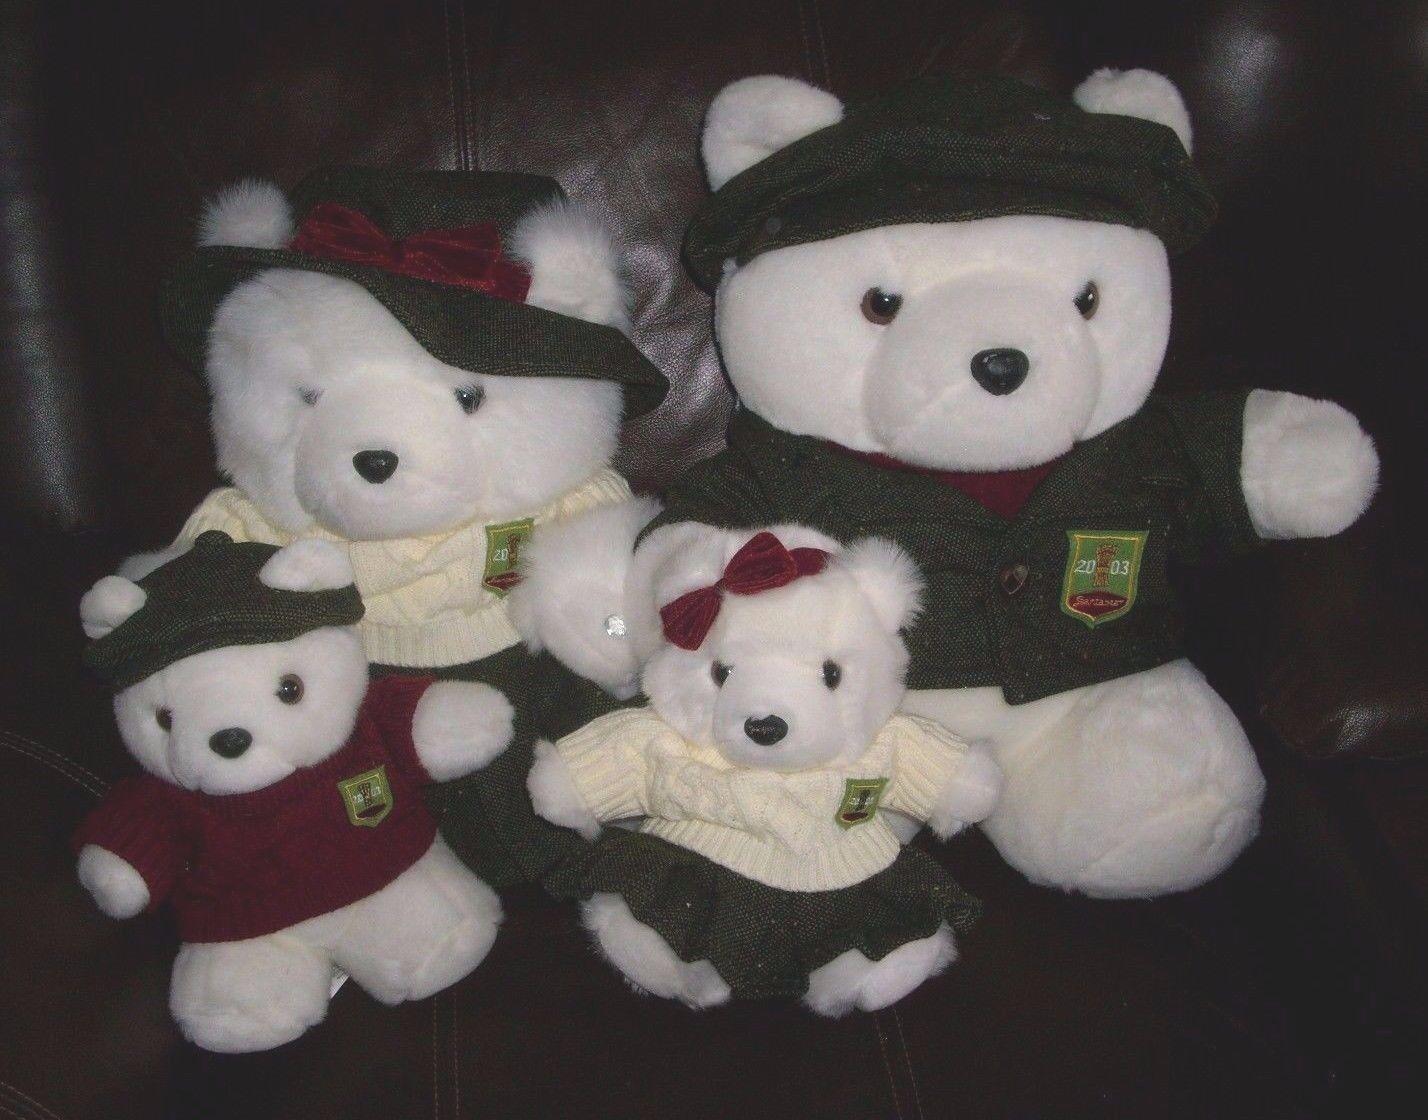 4 MARSHALL FIELDS 2003 SANTABEAR FAMILY MOM DAD TEDDY BEAR STUFFED ANIMAL PLUSH